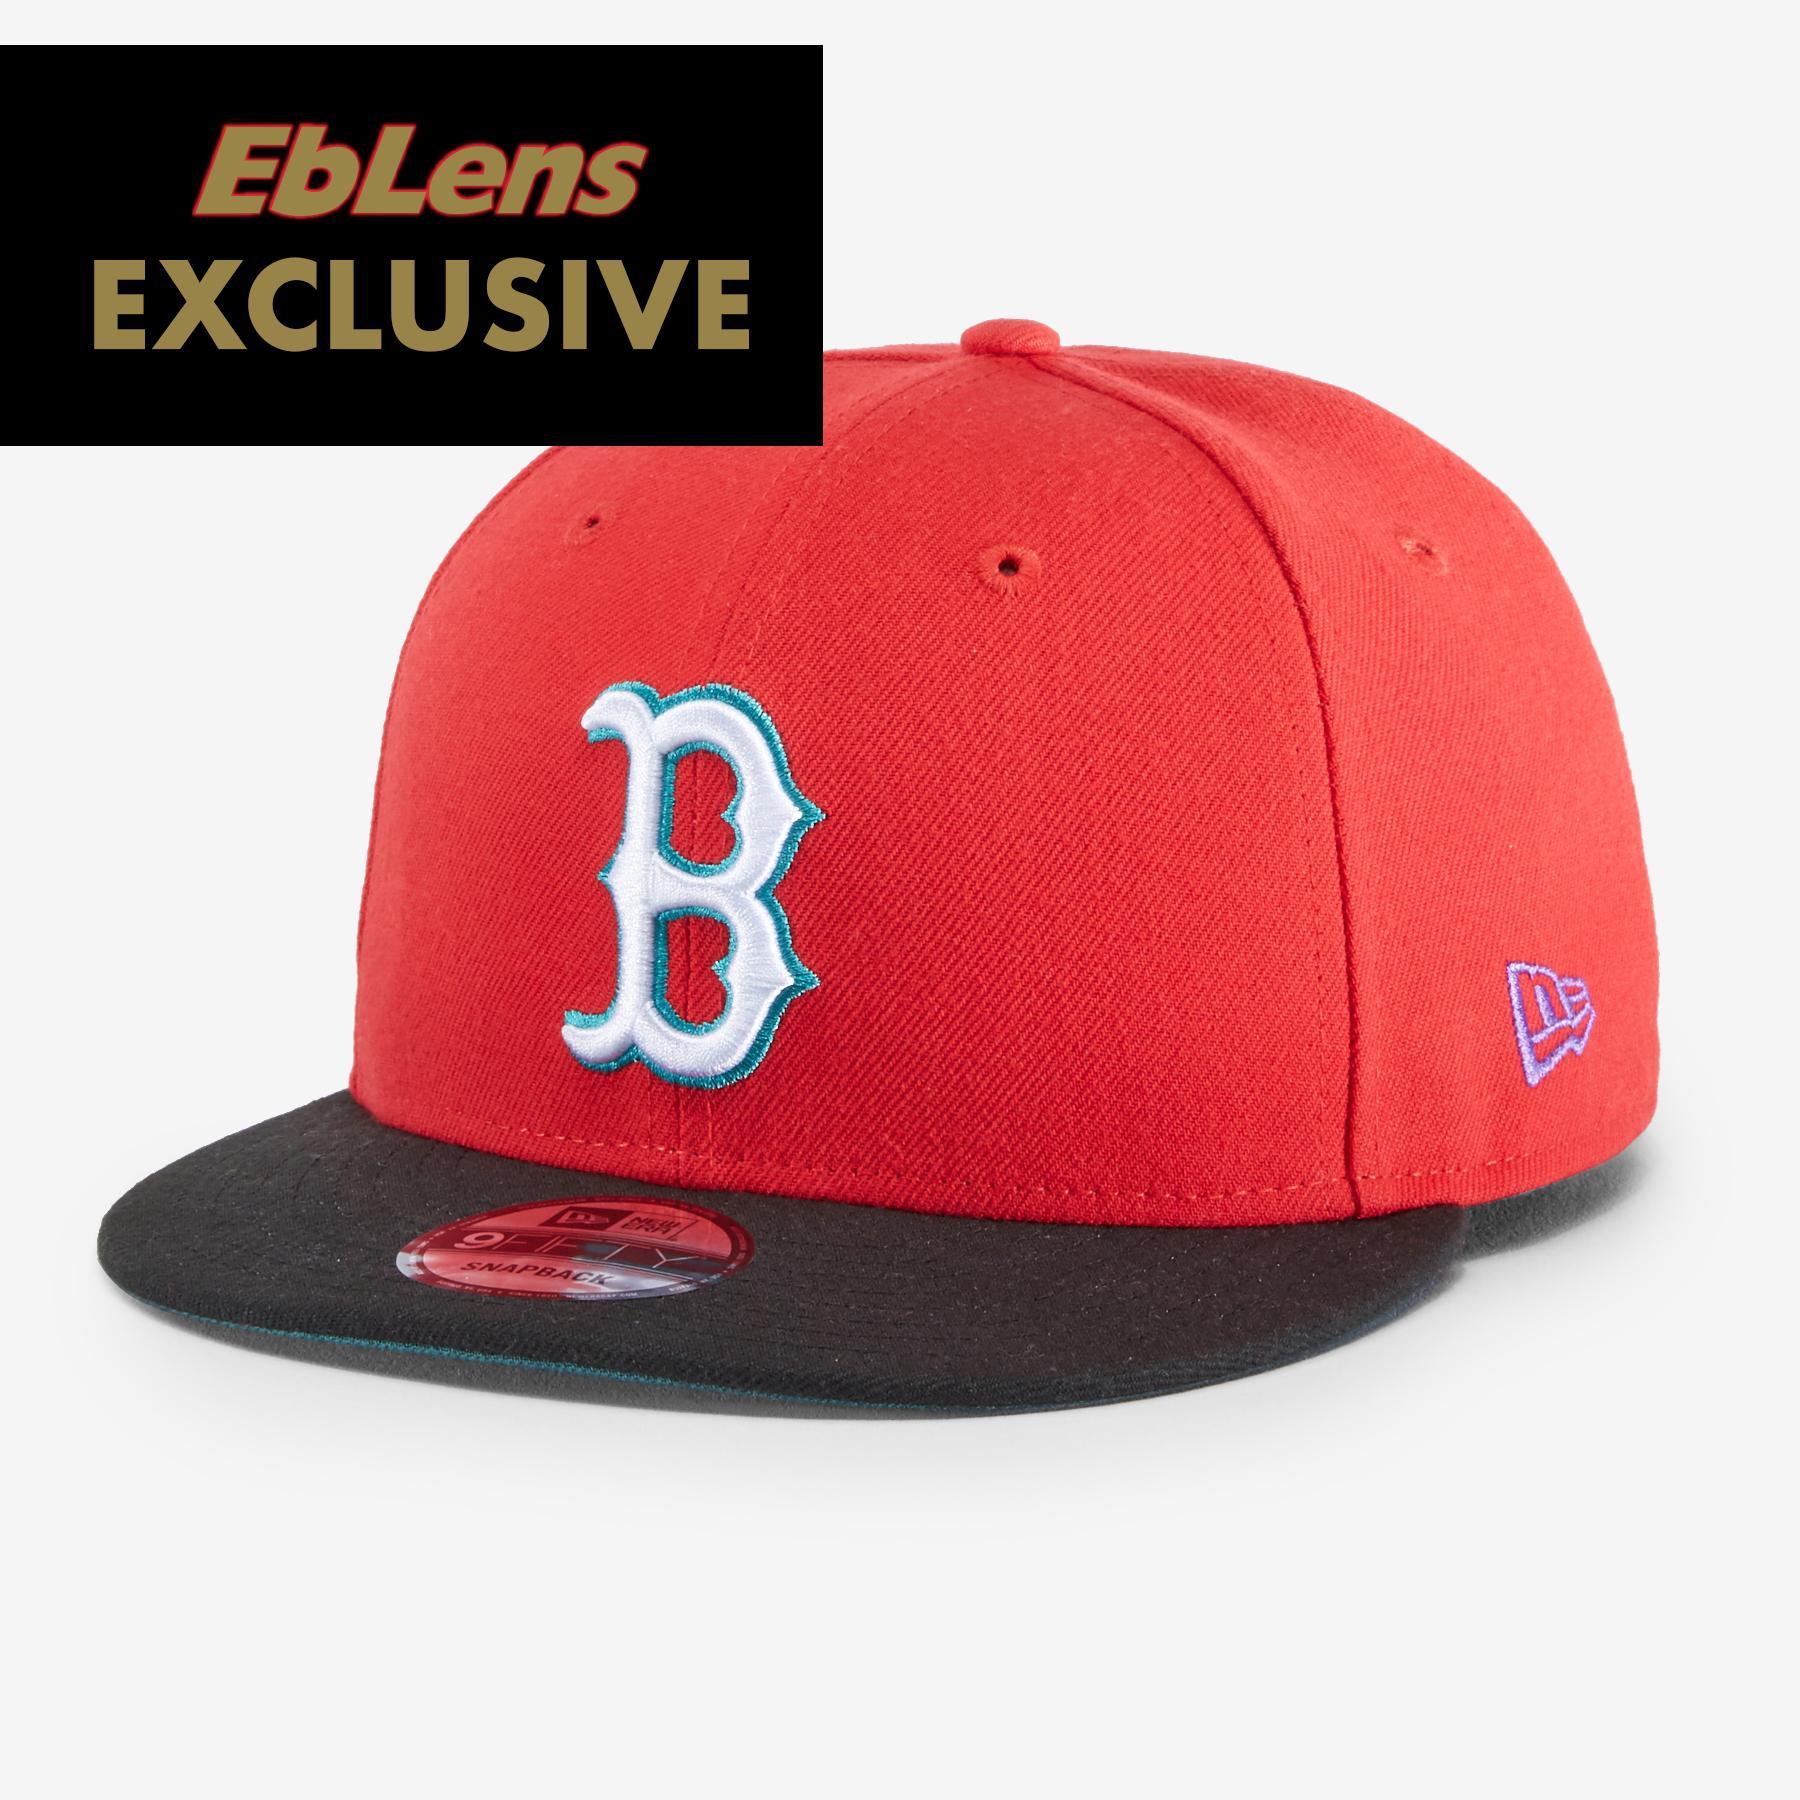 New Era X Eblens Red Sox 9fifty Snapback